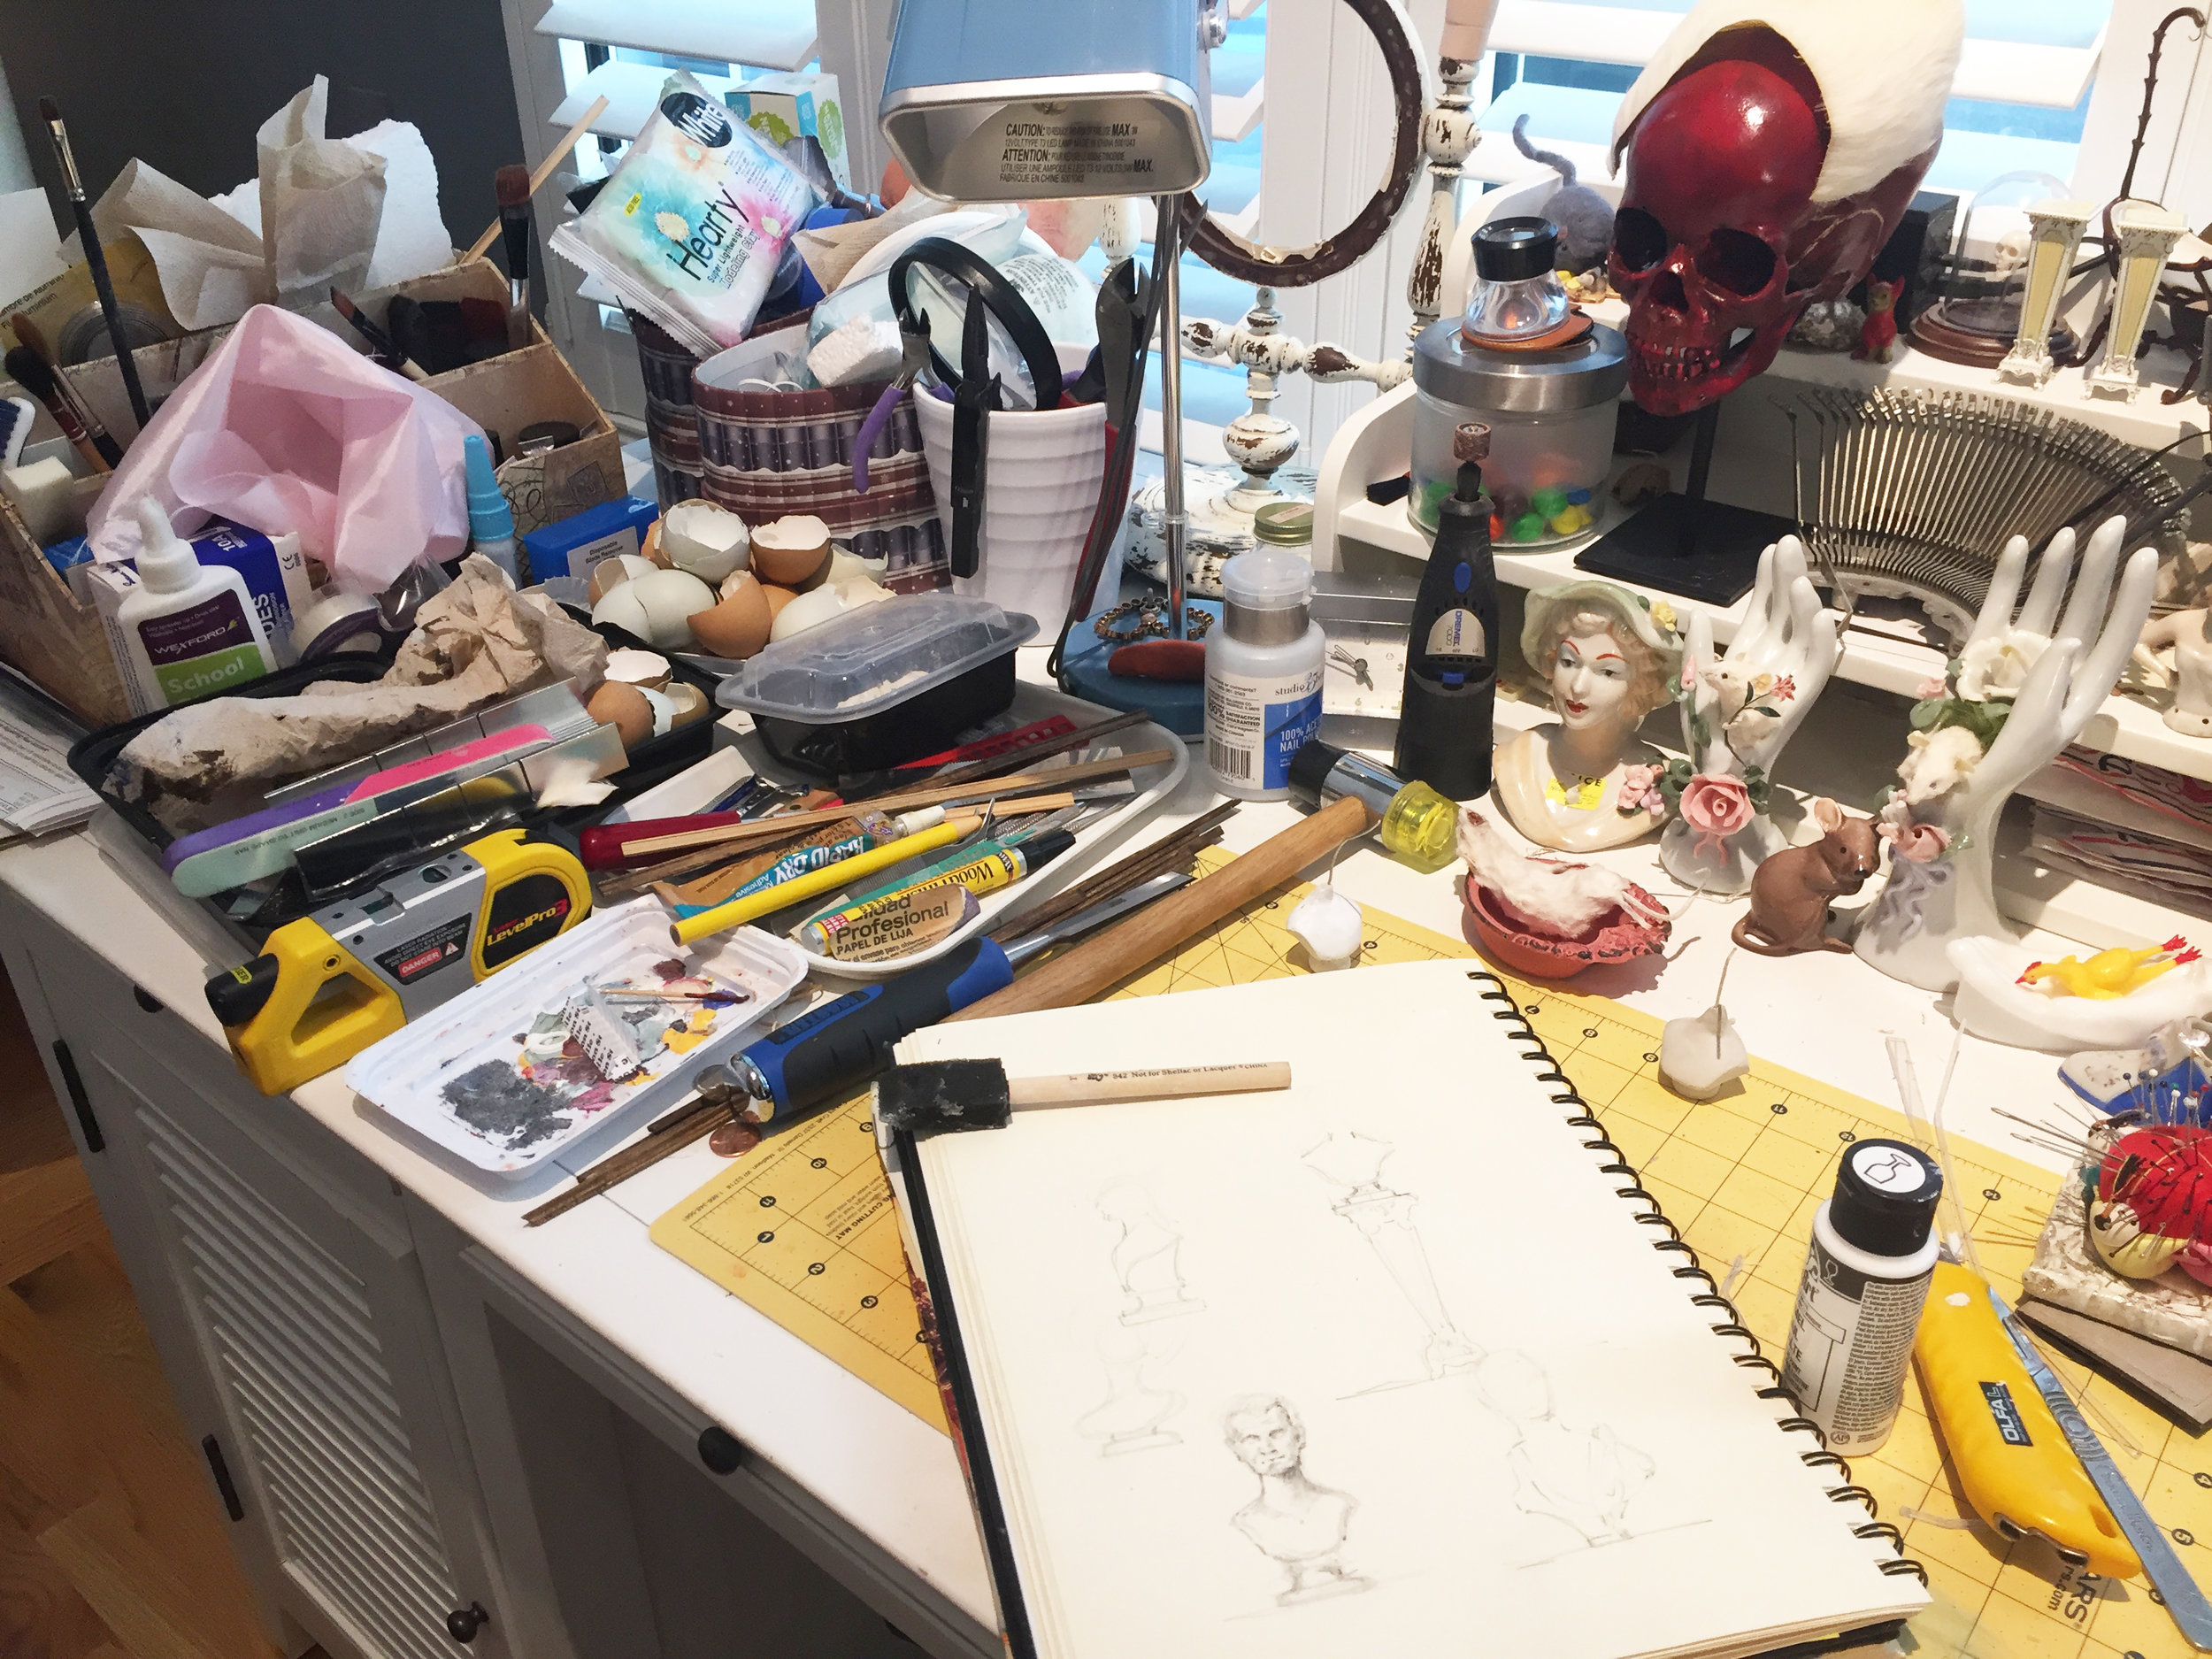 Elaine's home studio